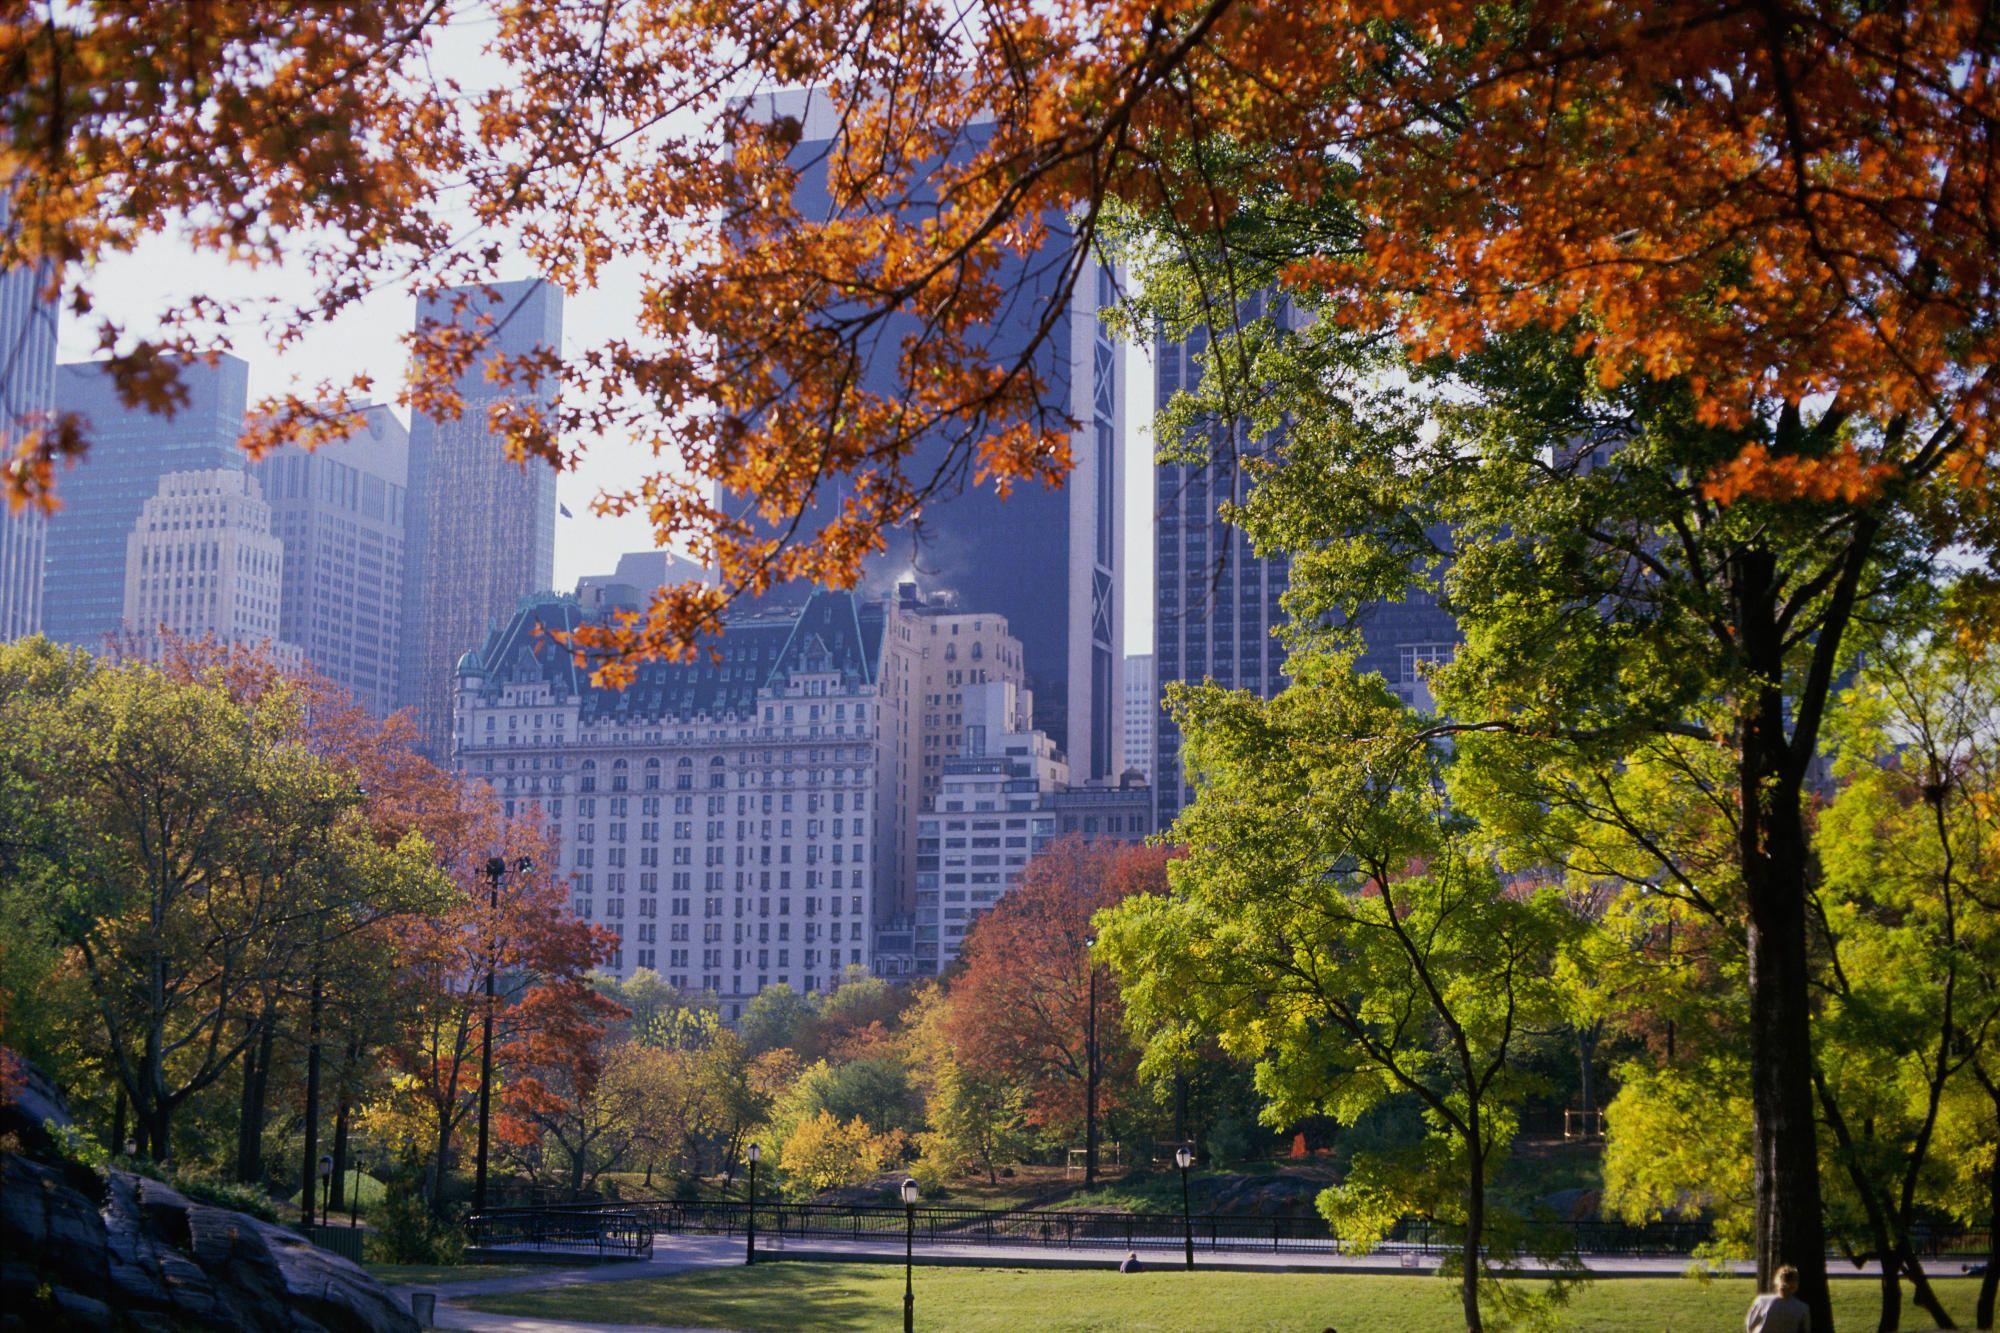 Cityscape Hd New York Wallpaper Central Park New York Tourist